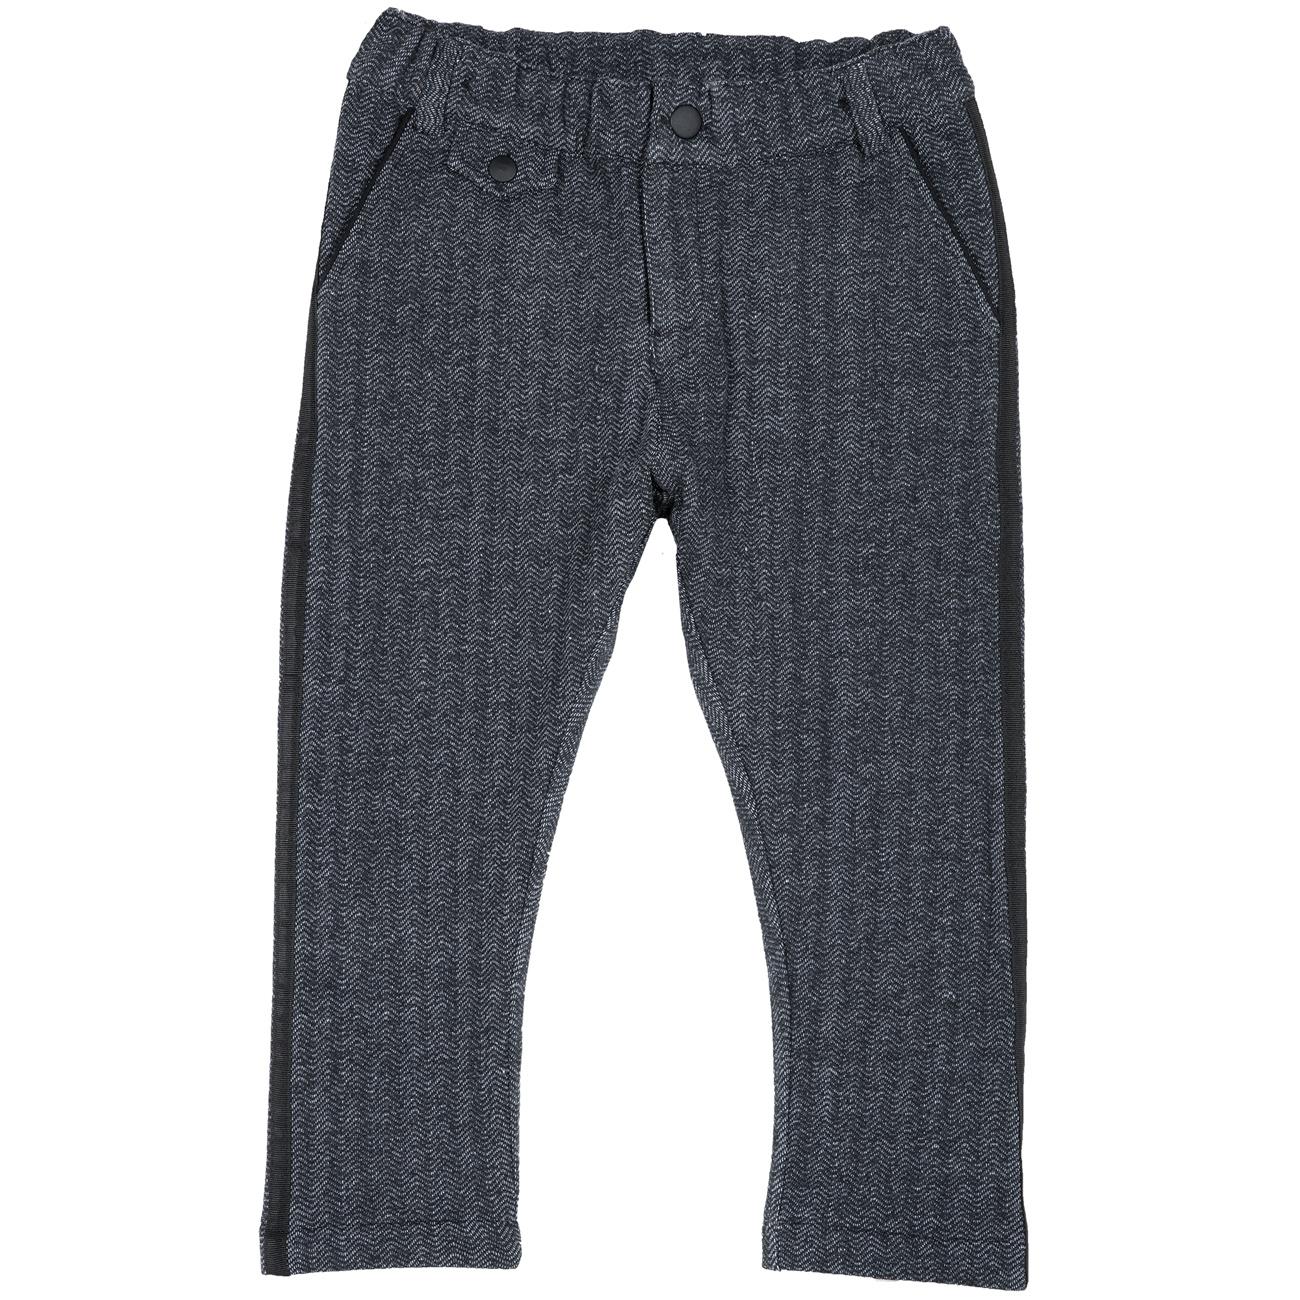 Pantalon copii Chicco negru 110